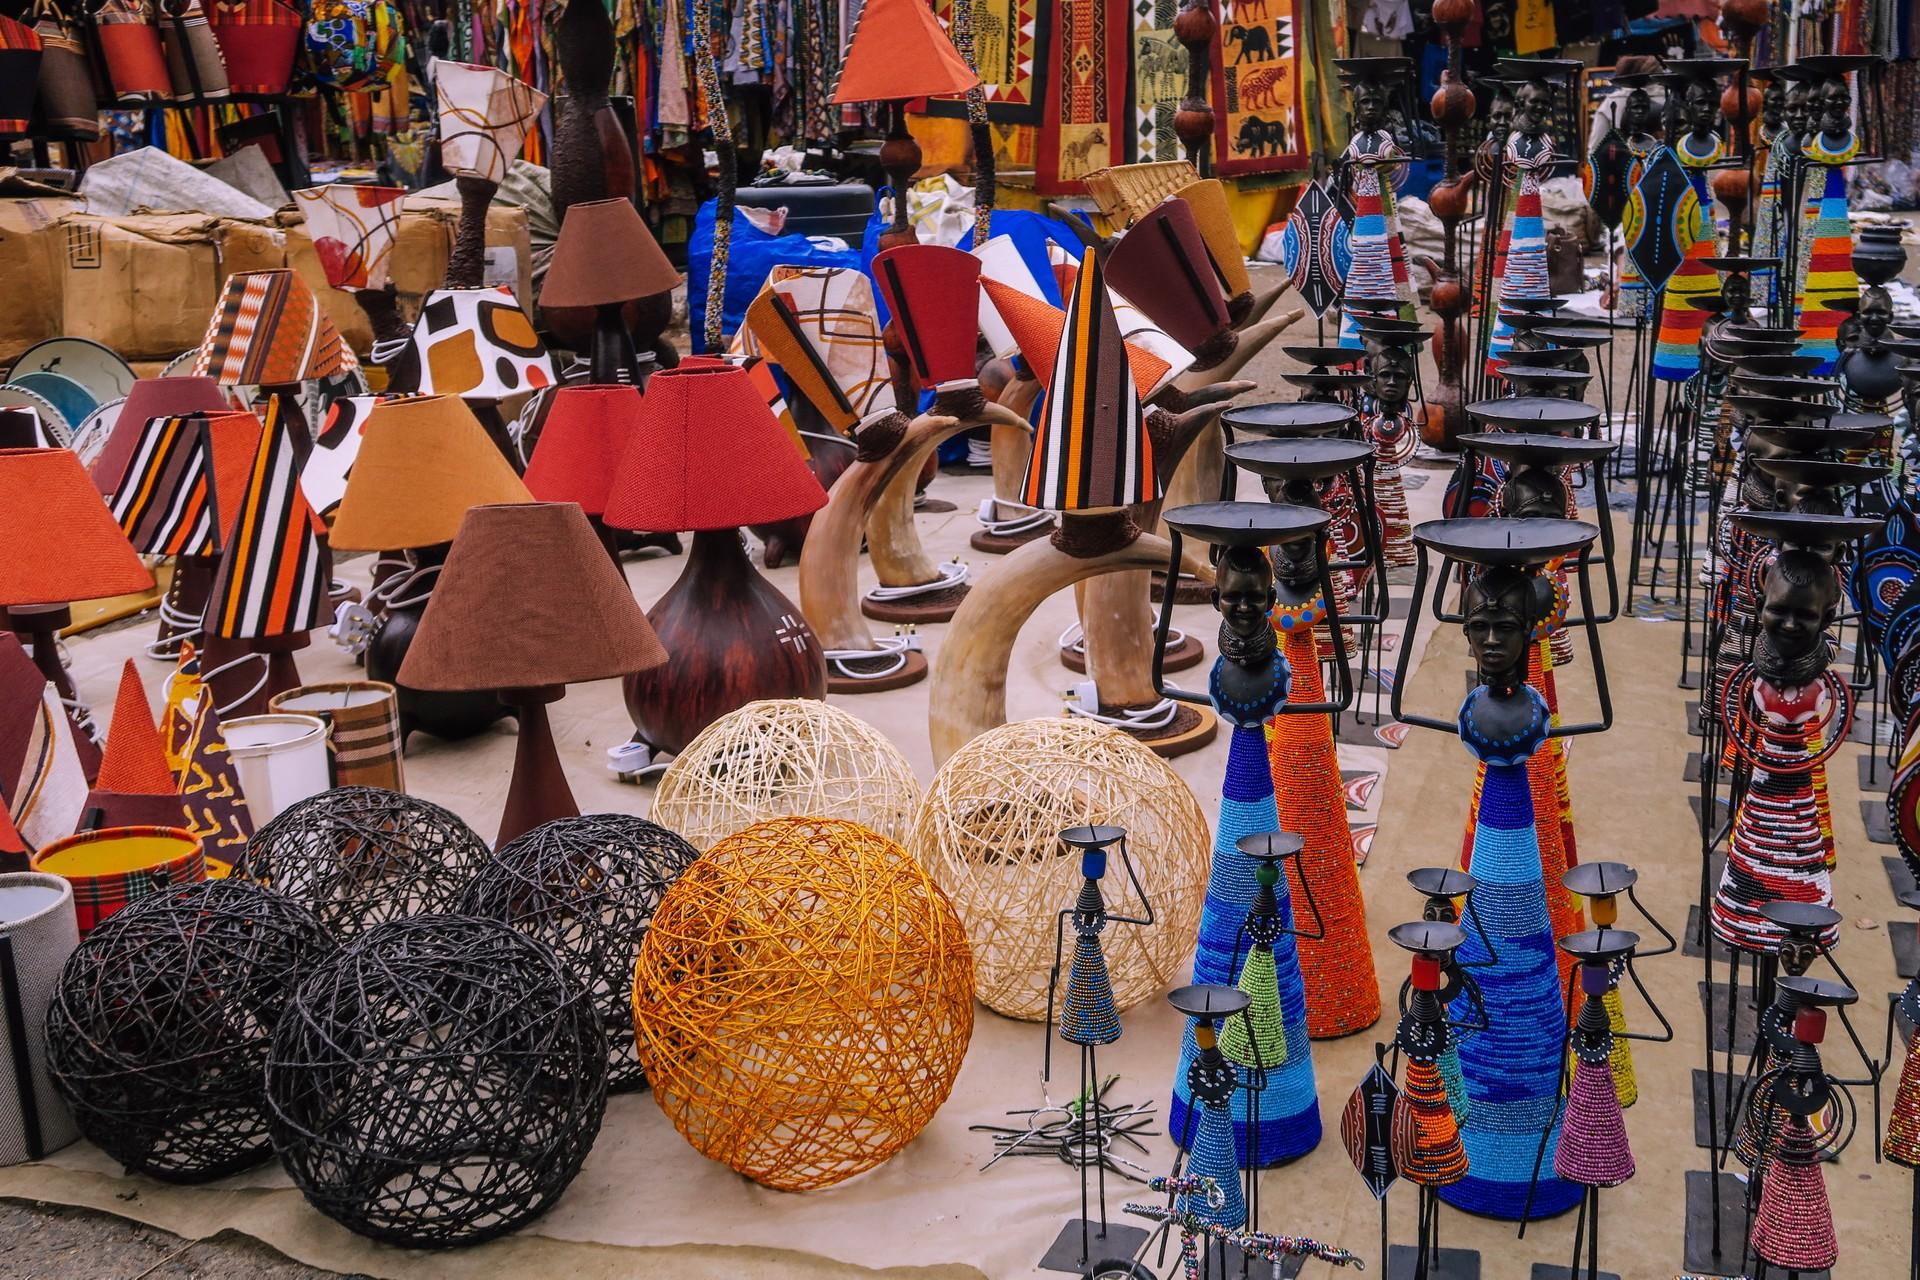 Craft stall in Nairobi Market